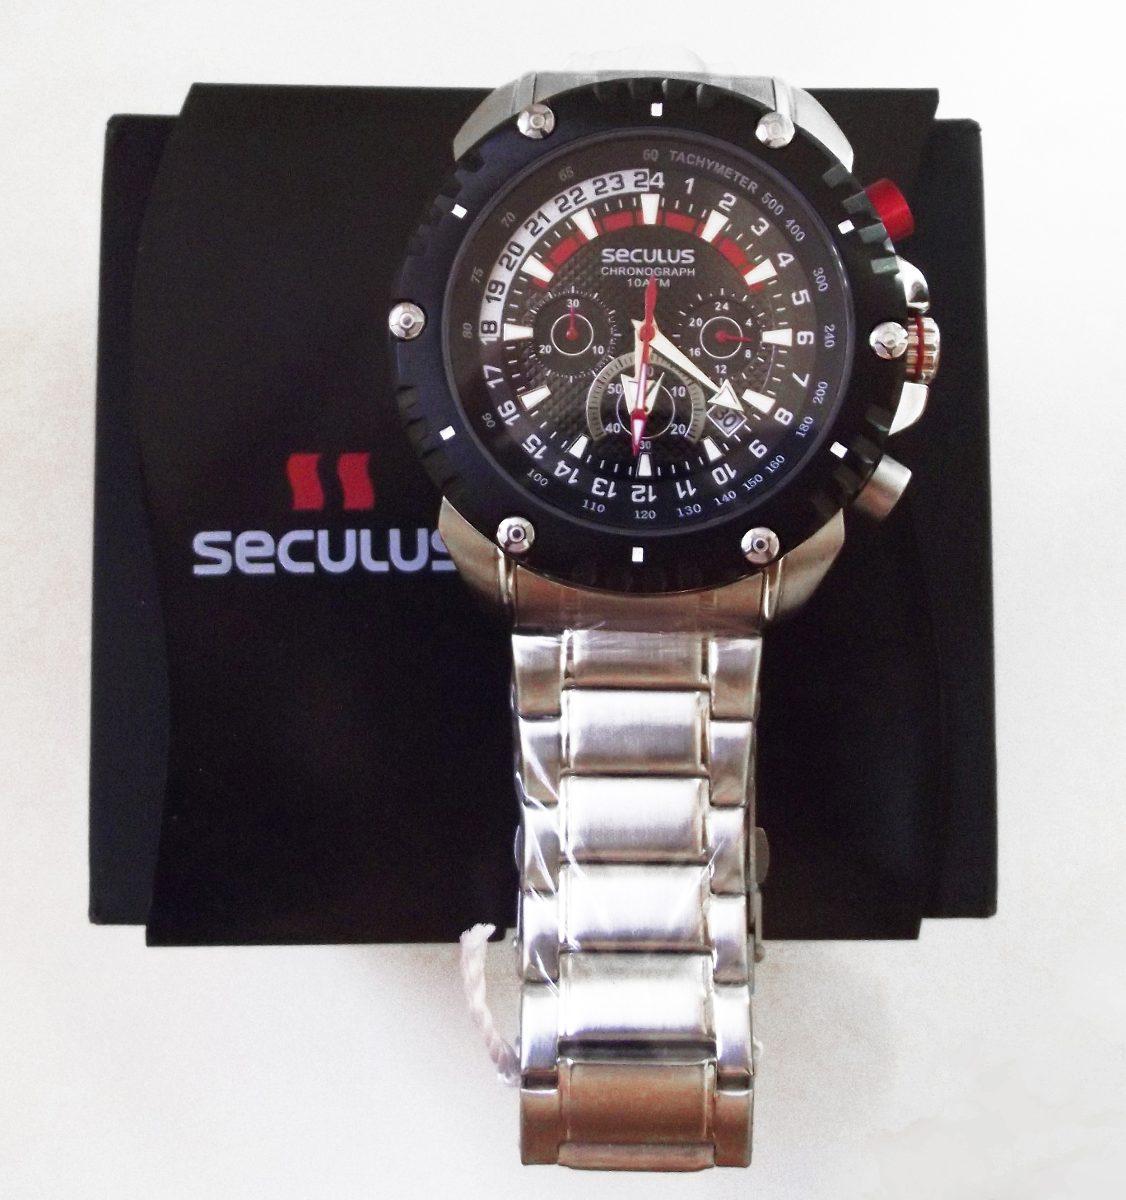 10b98cfc51a relógio seculus barato cronometro analogico masculino. Carregando zoom... relógio  seculus masculino. Carregando zoom.